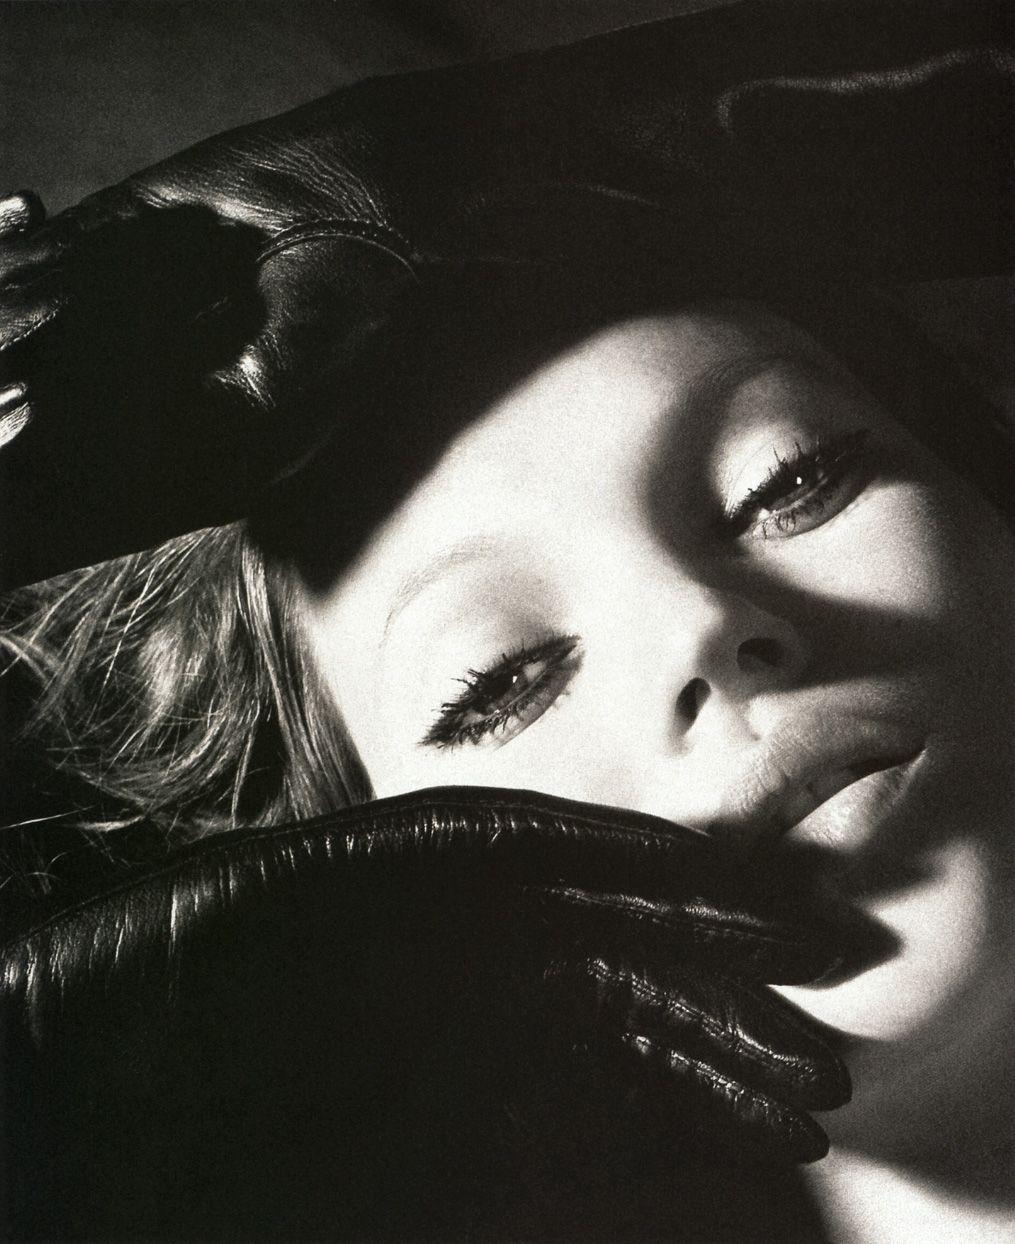 Kate Moss - Photography by Mert Alas & Marcus Piggot #katemoss #supermodel #queenoffashion #queenofmodels